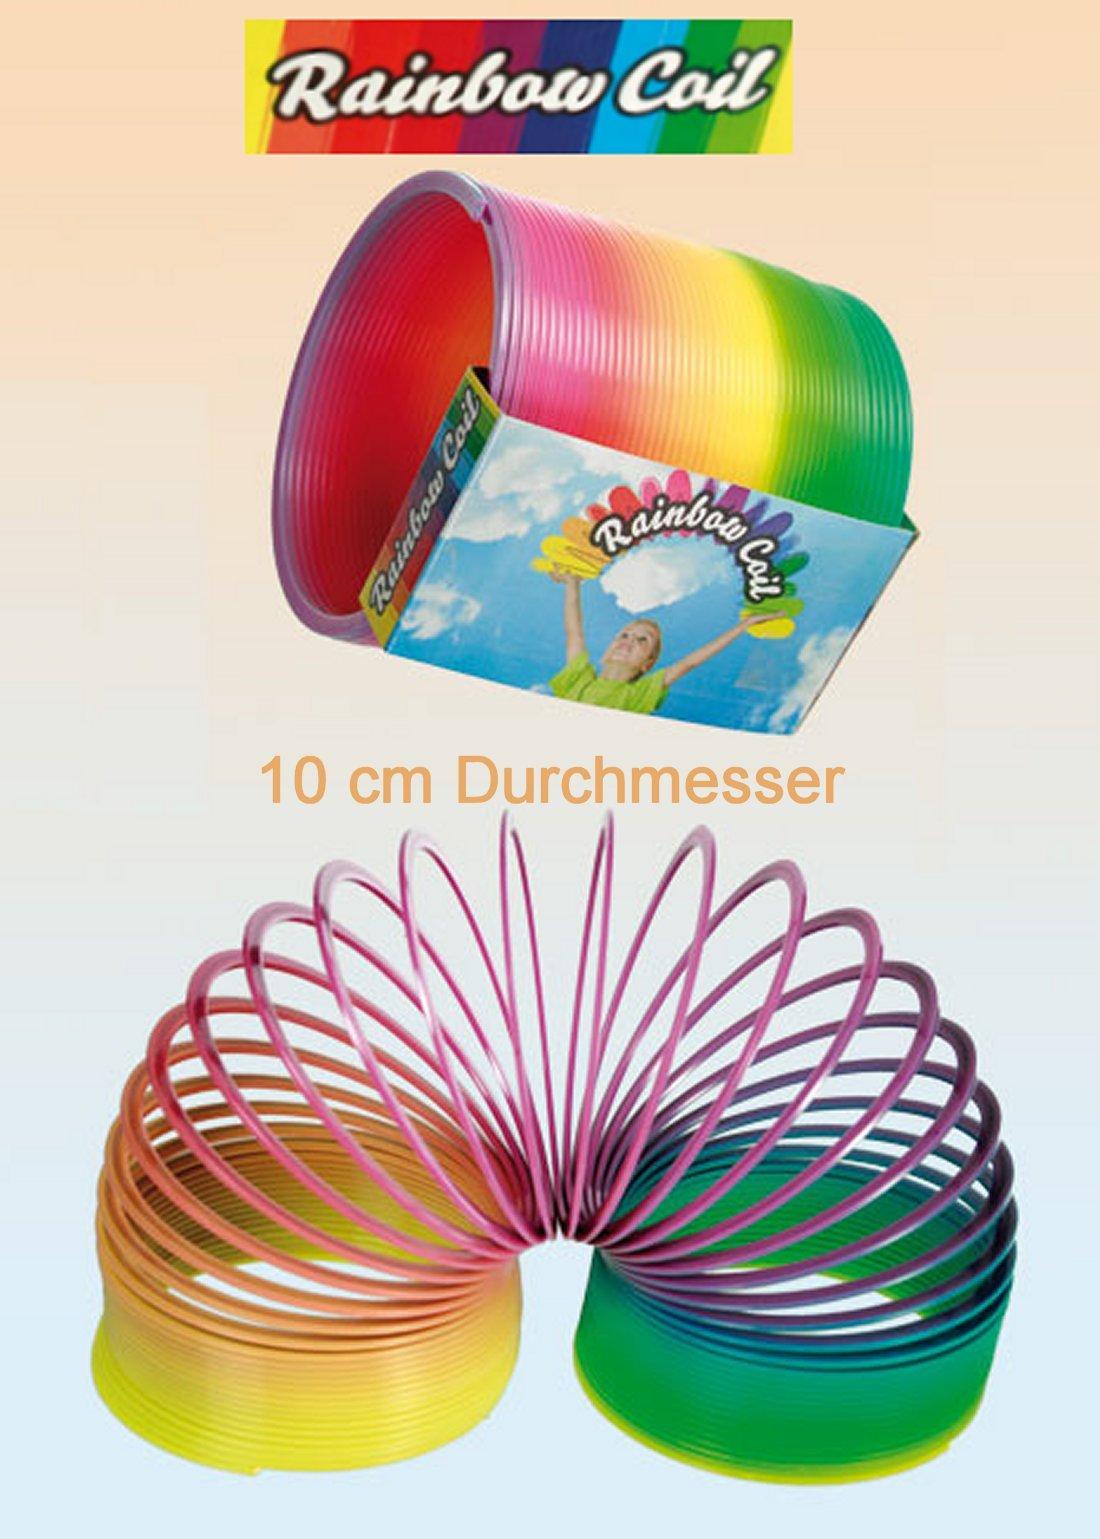 Out-of-the-Blue-612048-Kunststoffspirale-Regenbogen-Schreibwaren-10-cm